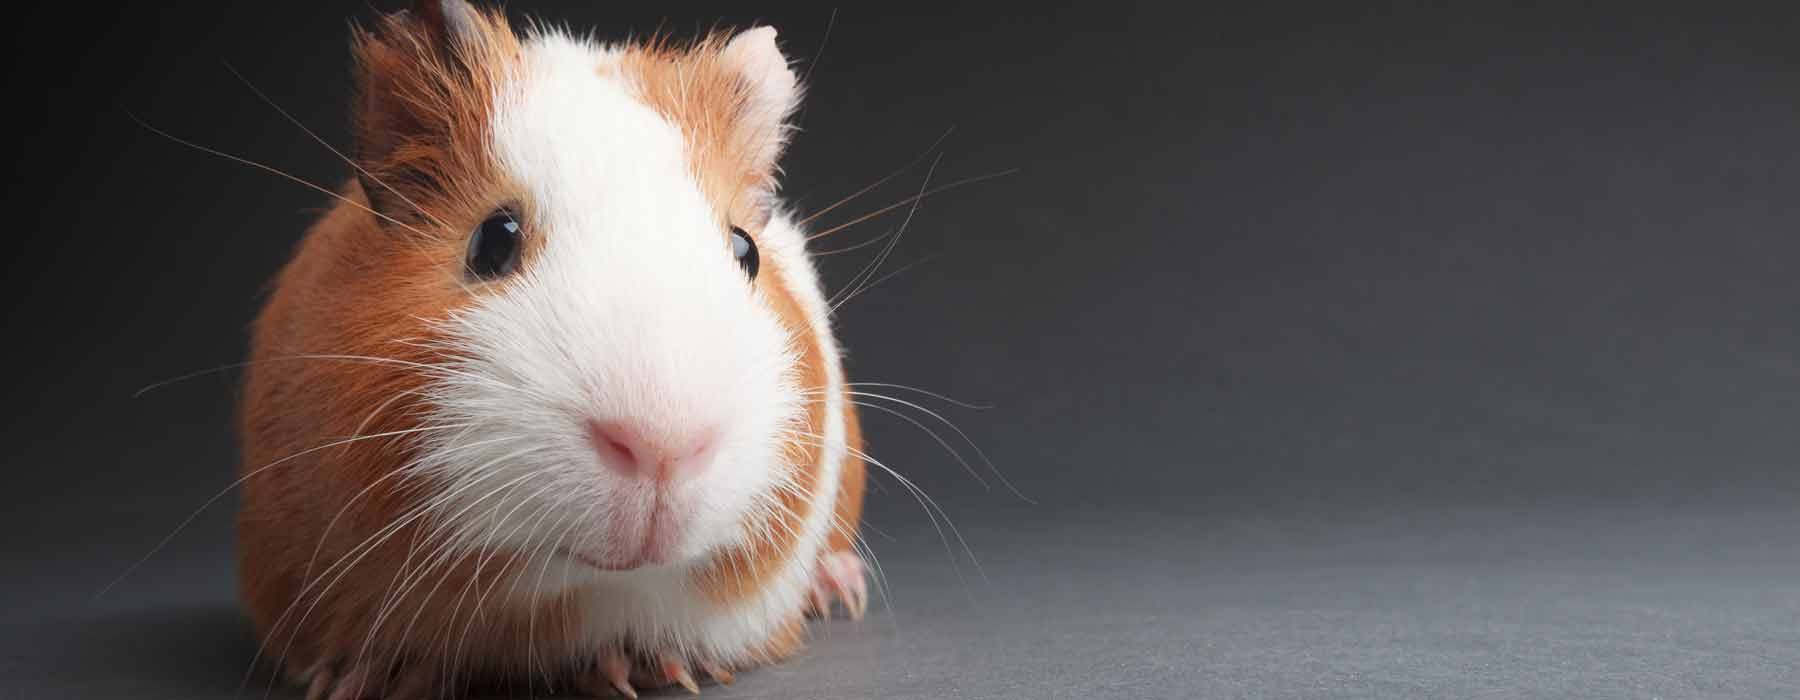 ginger and white guinea pig